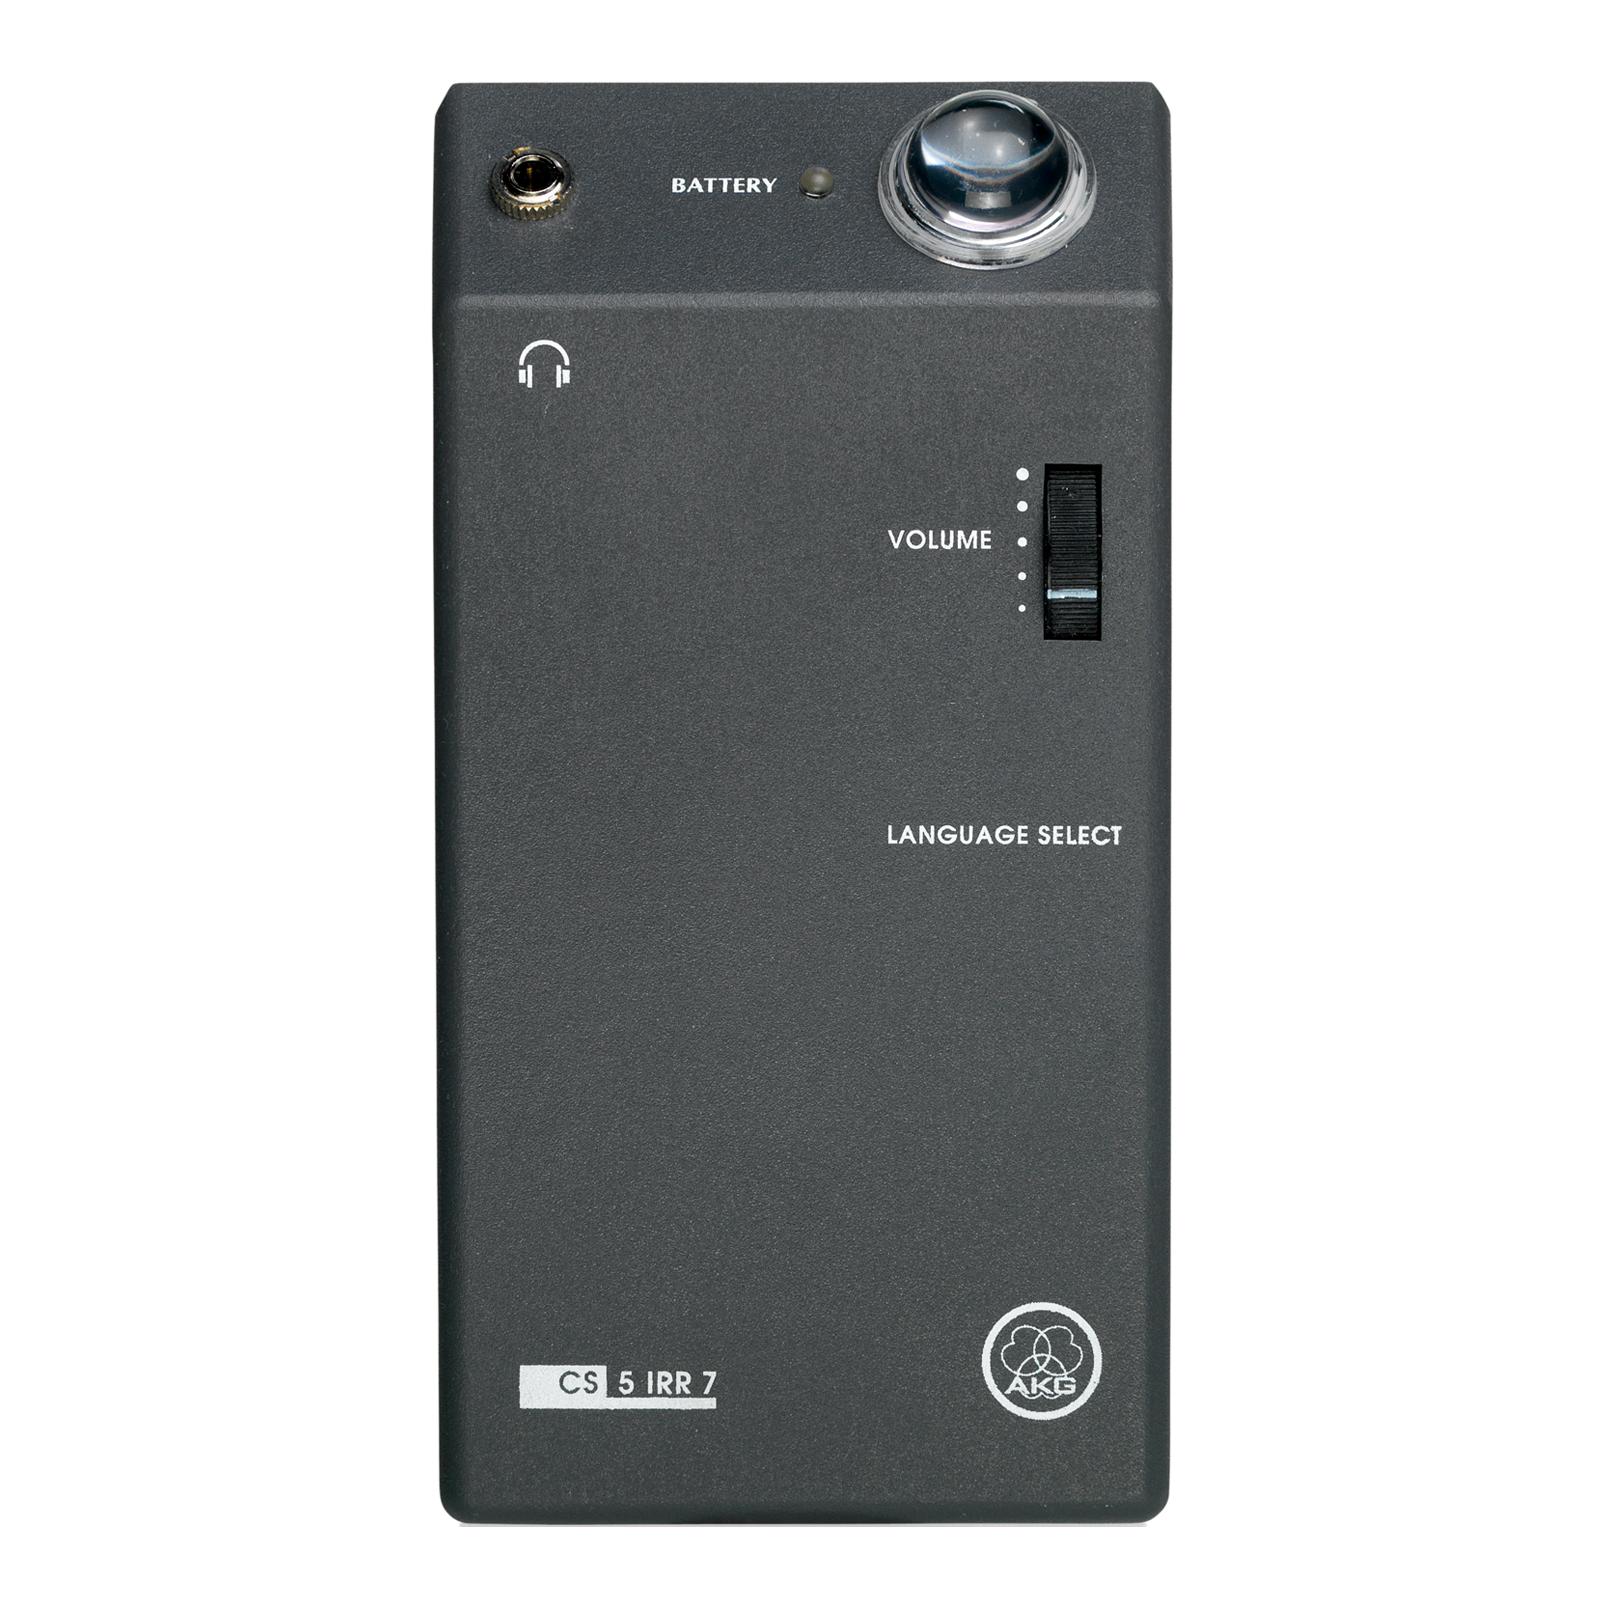 CS5 IRR7 (discontinued)